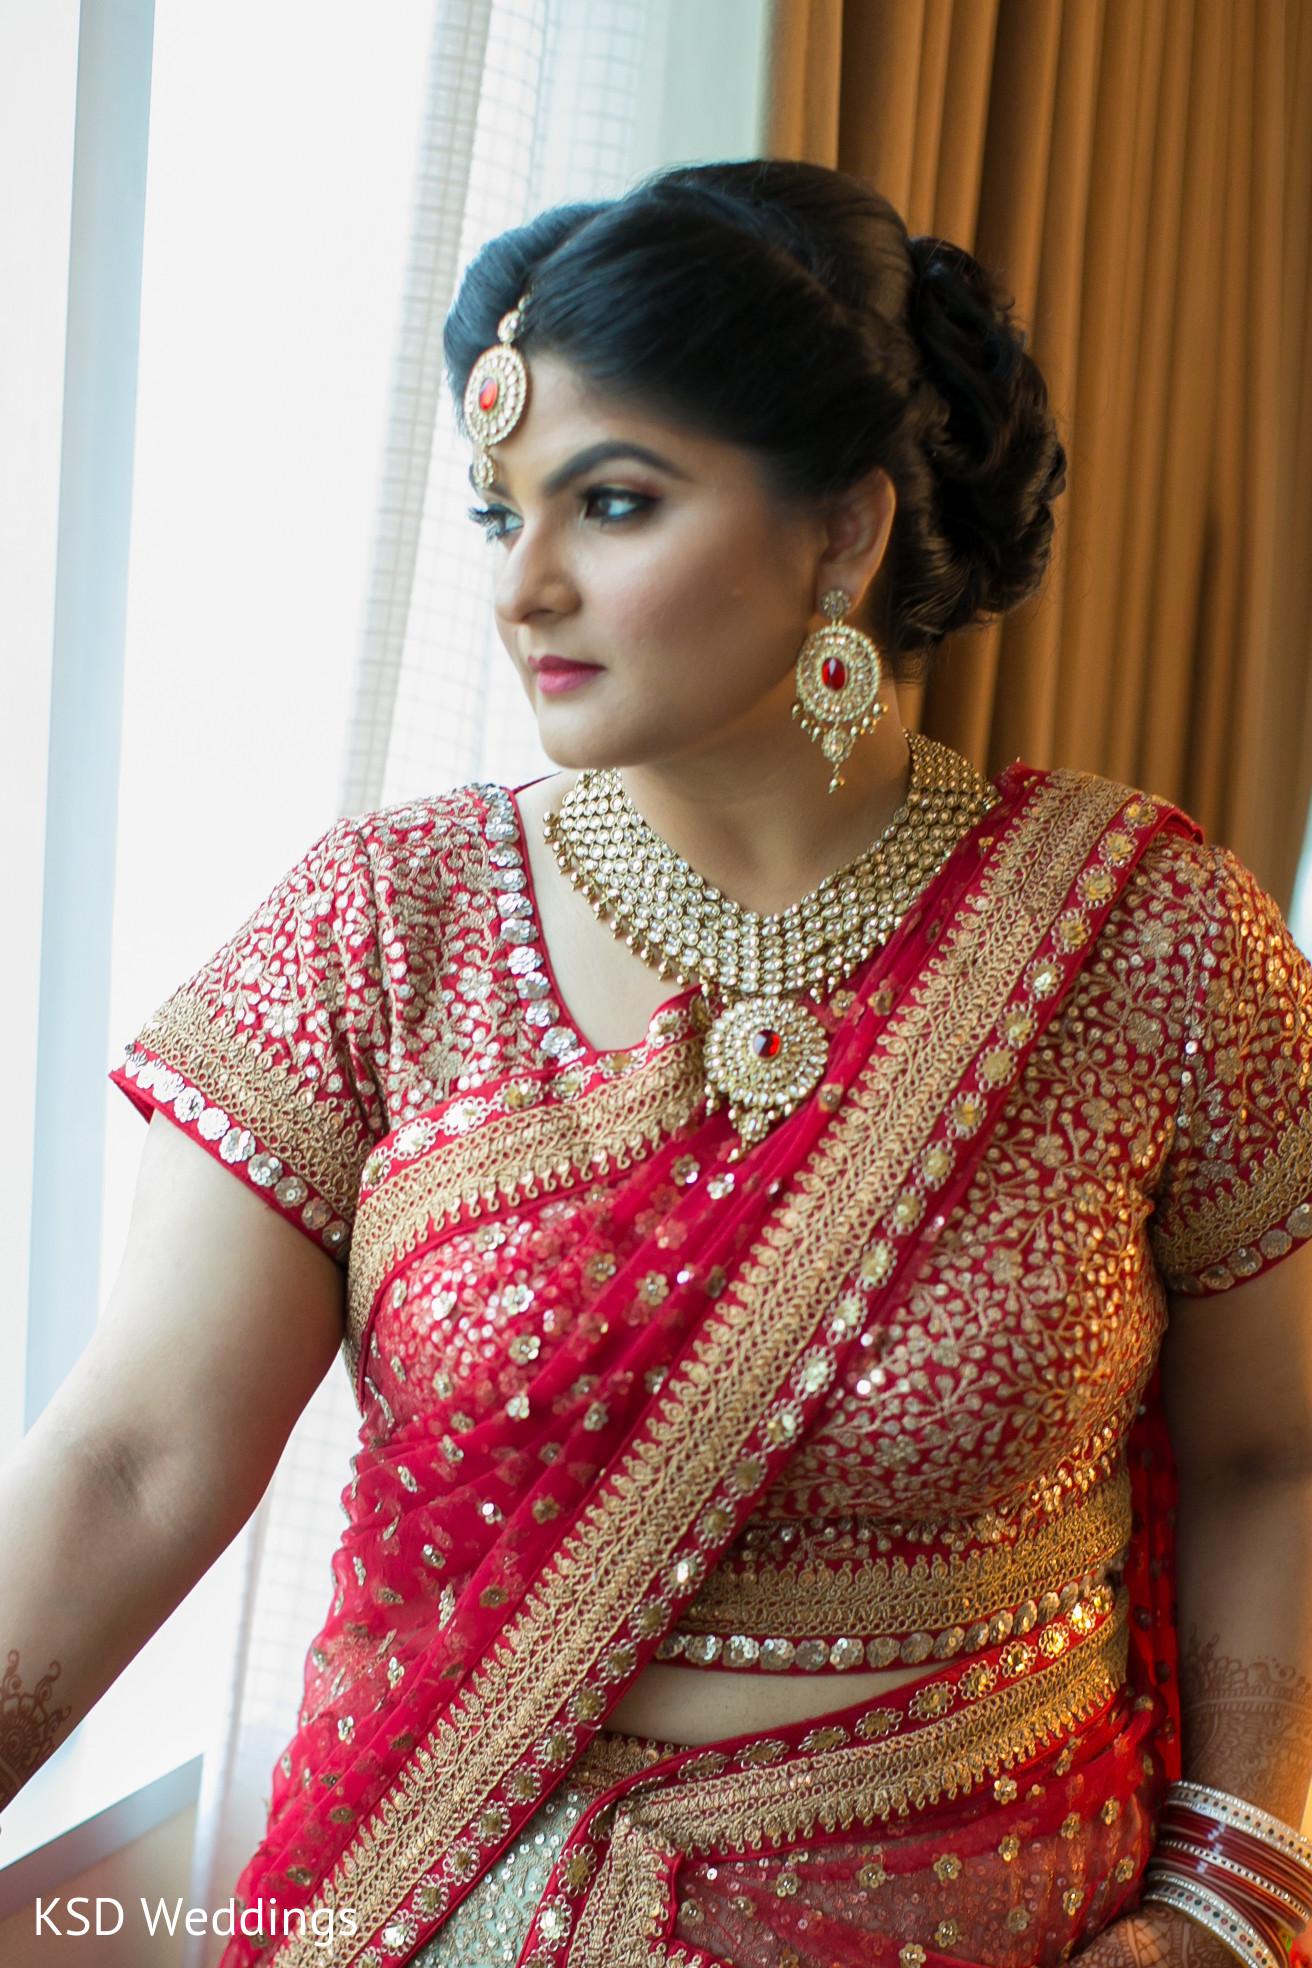 Bridal Portrait in Mahwah, NJ Indian Wedding by KSD ...